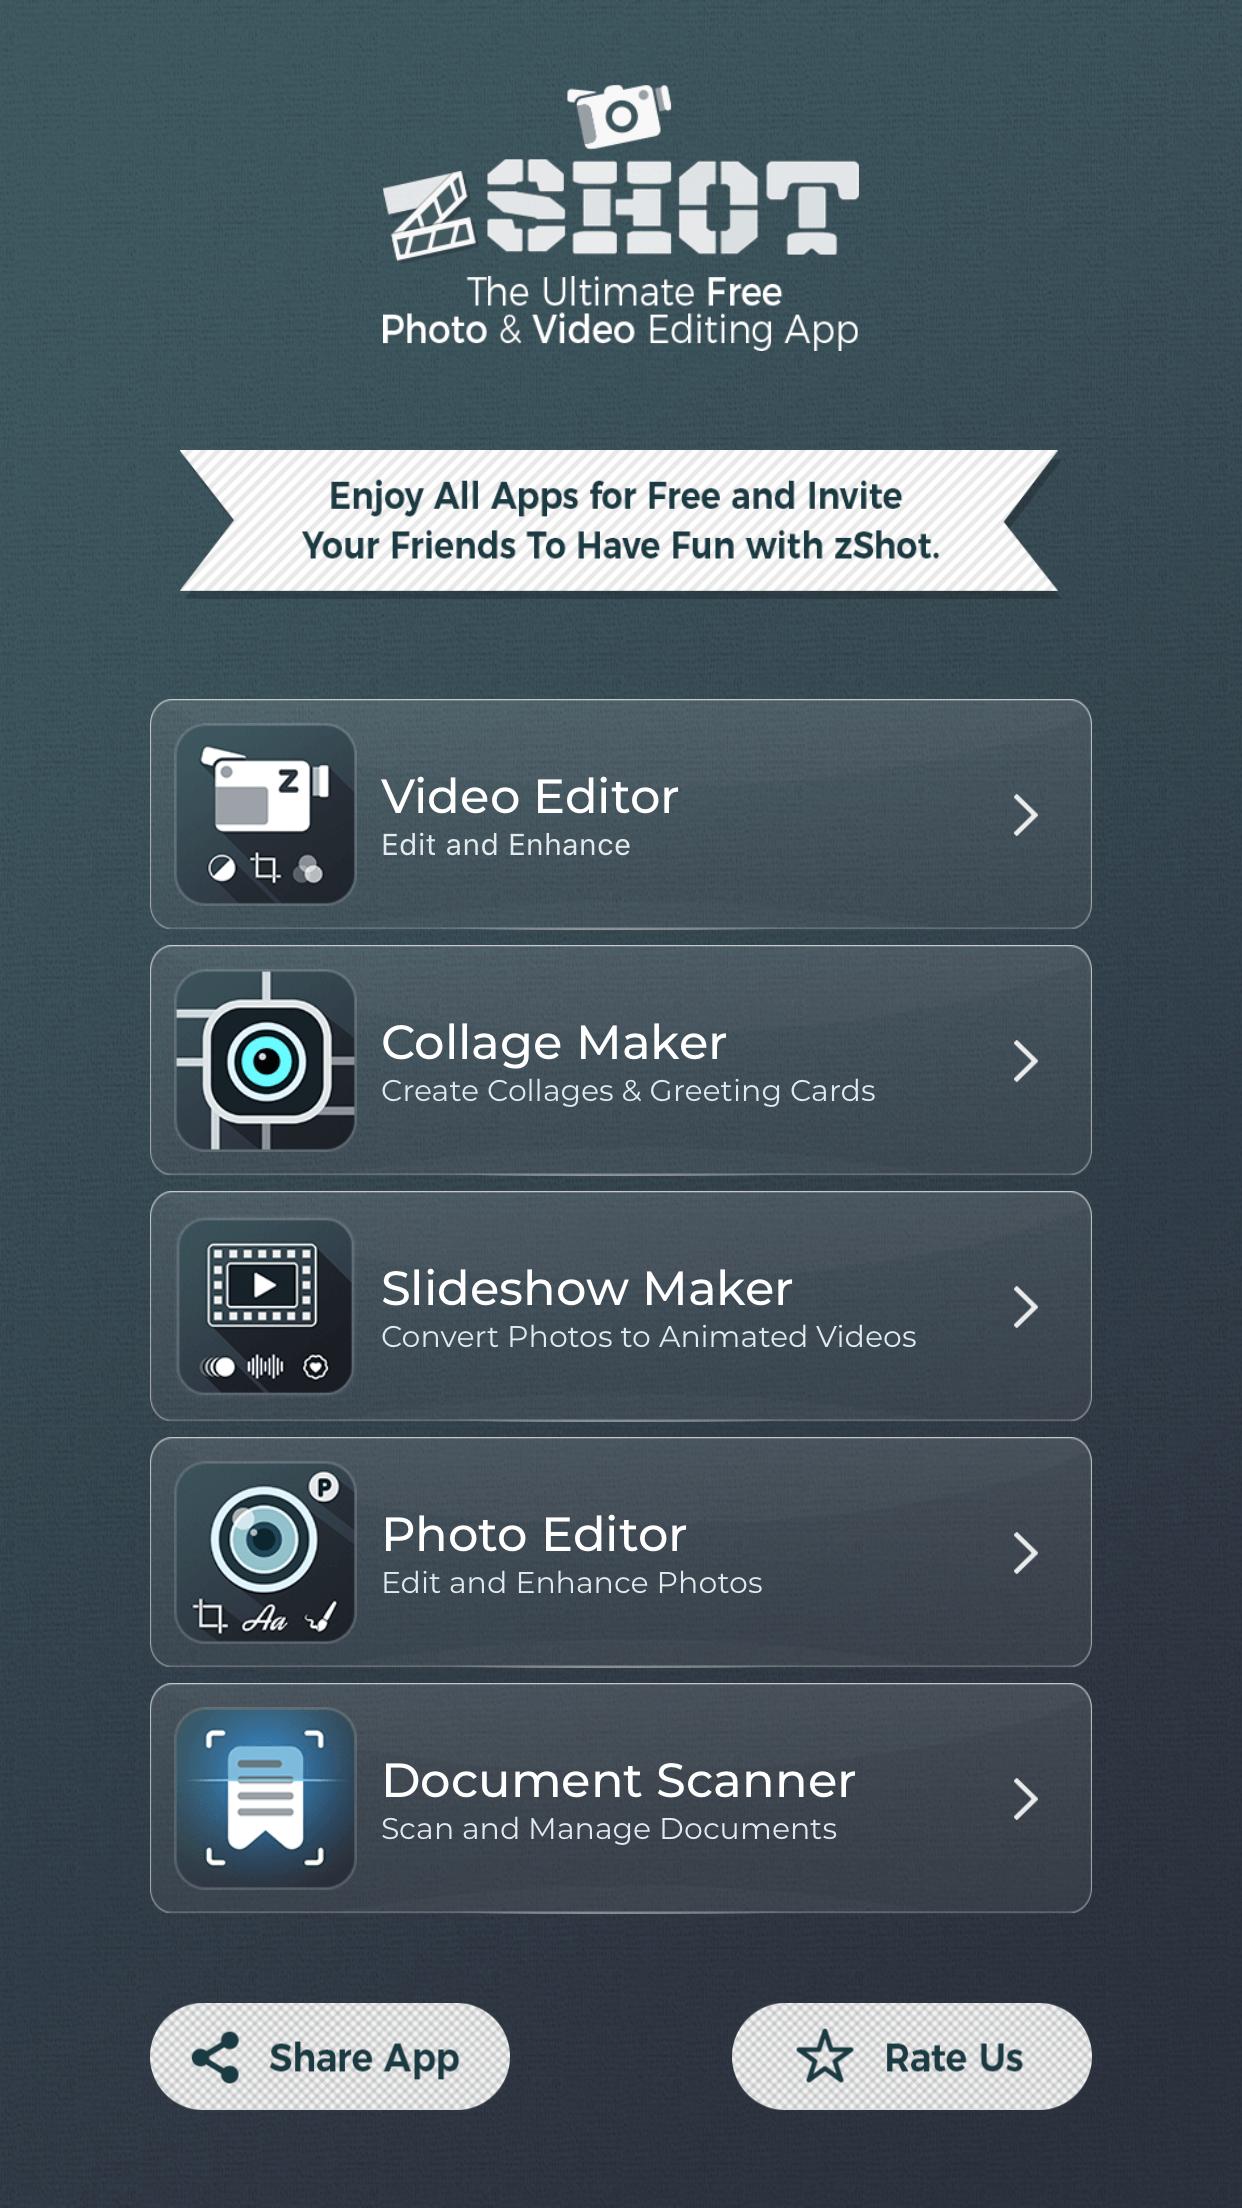 zShot app is five amazing apps in one.